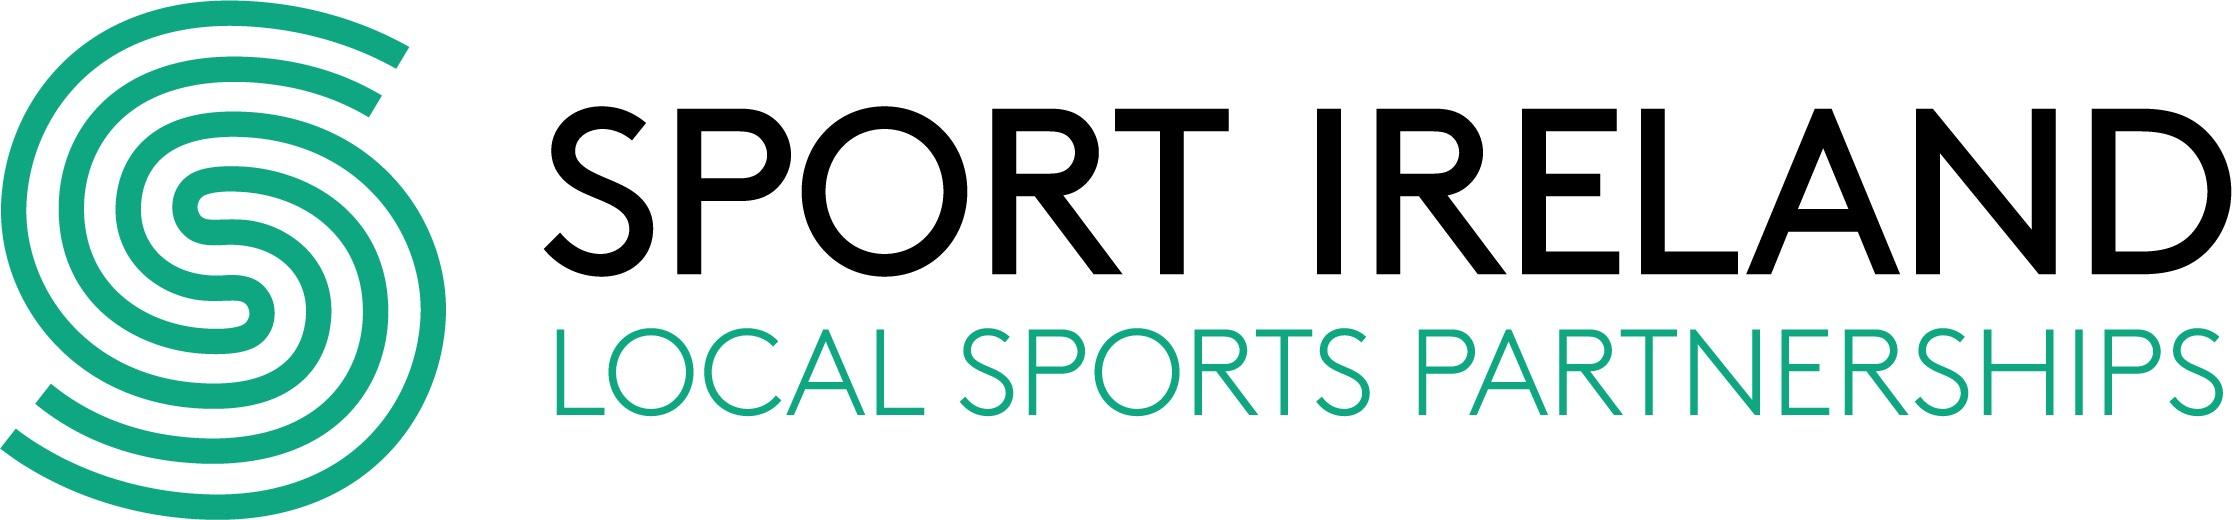 Sport Ireland_LSP_JPG.jpg